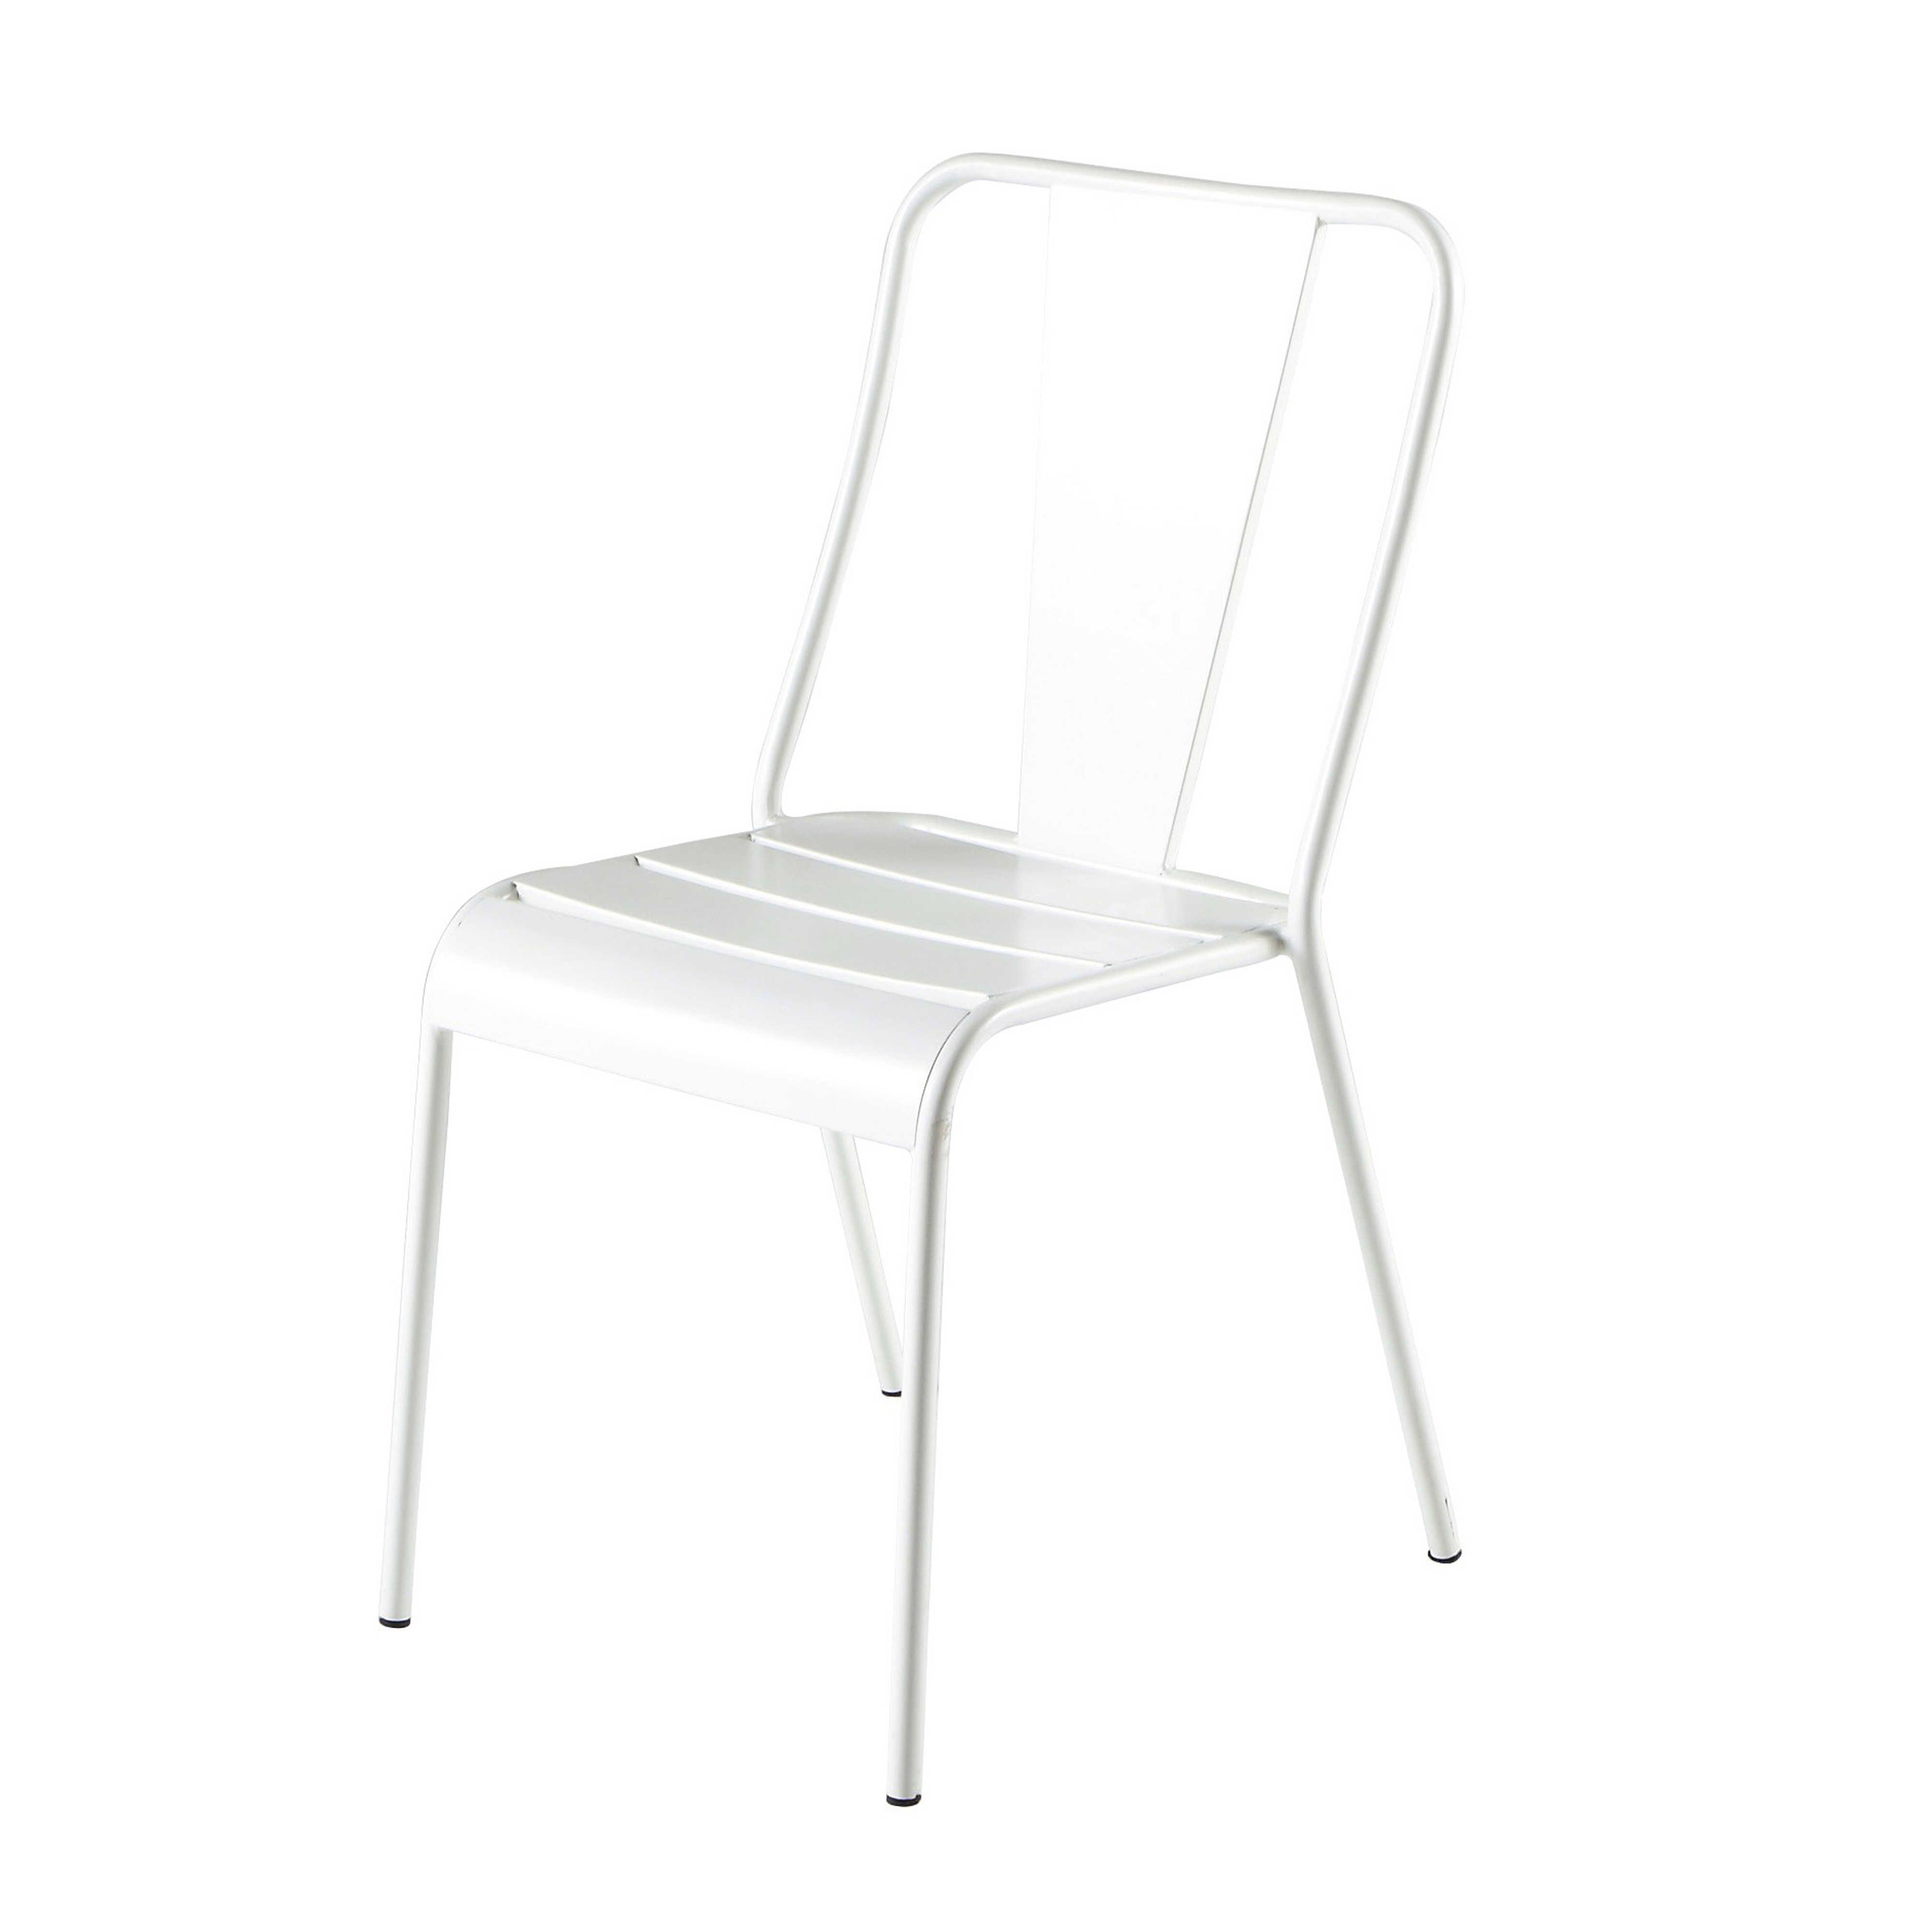 Chaise De Jardin En Metal Blanche Pinterest Chaises De Jardin En